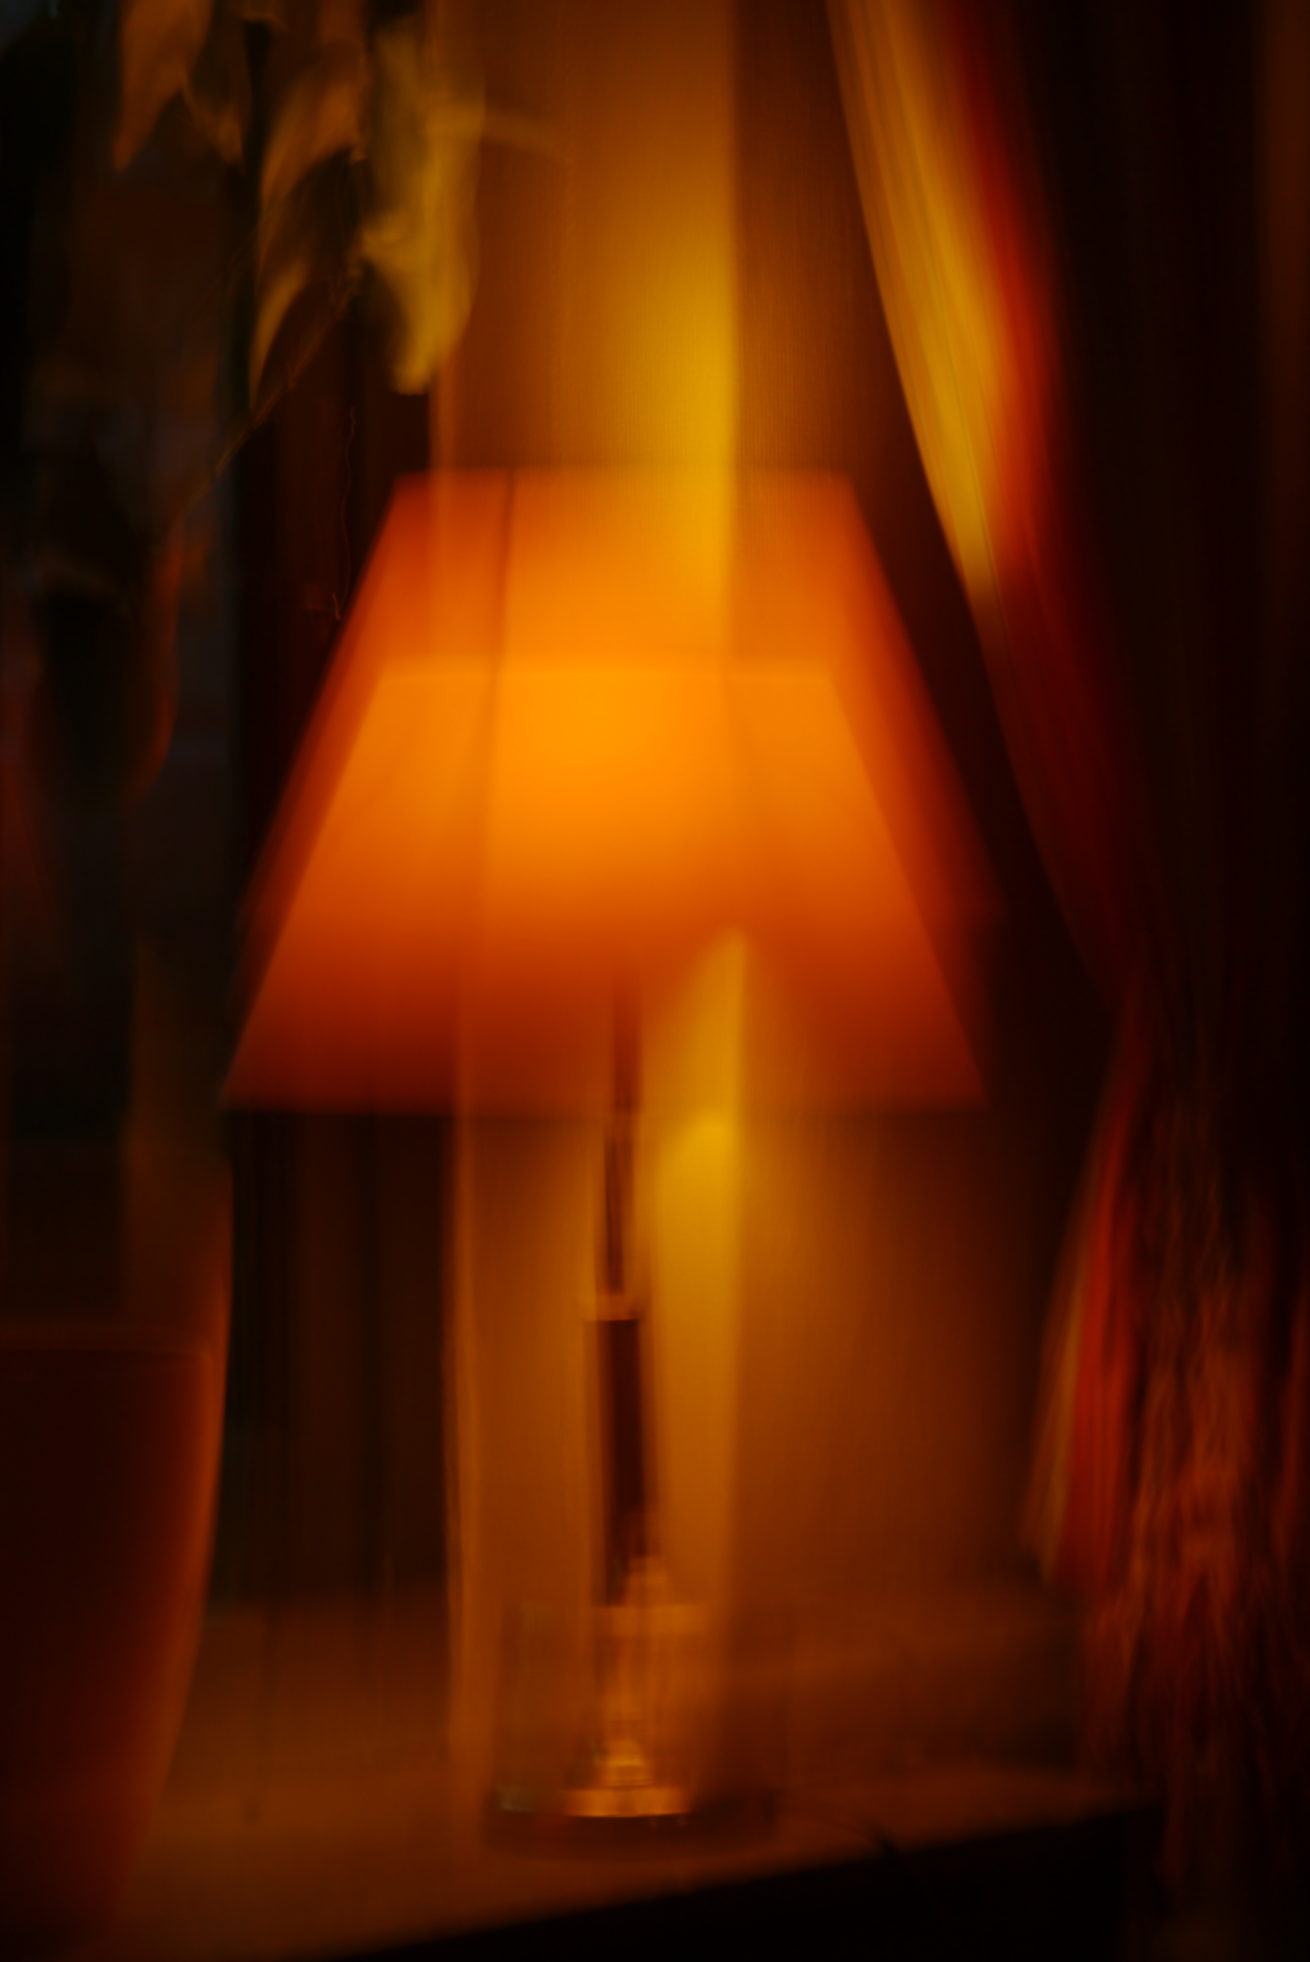 Lampe_im_Fenster